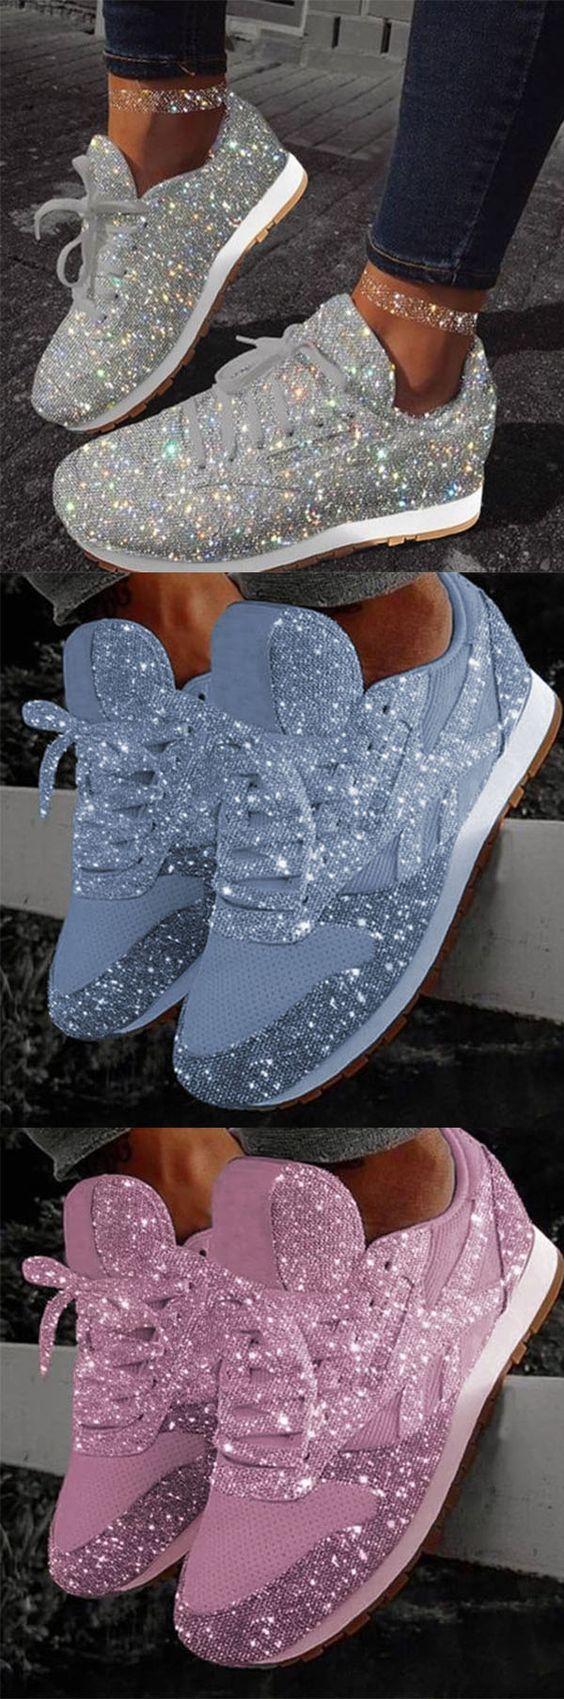 Platform sneakers, Glitter shoes